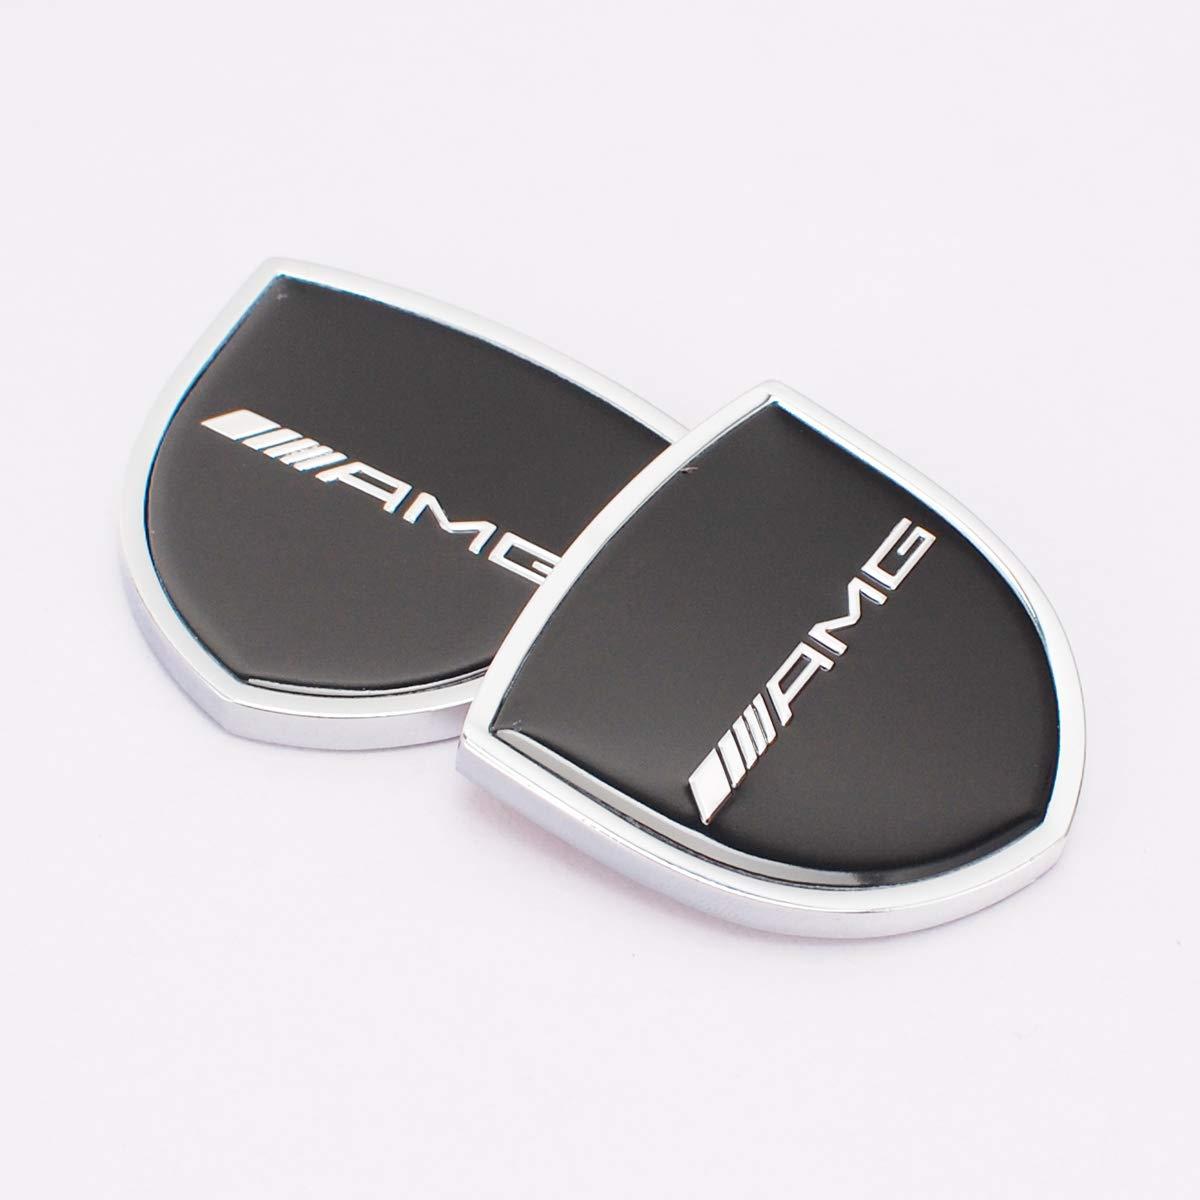 Zhmyyxgs 2 Pcs Shield Refit Logo Auto Car Rear Side Fender Stickers Metal Decorative Logo Emblems Badge Logo Accessories for Mercedes-AMG